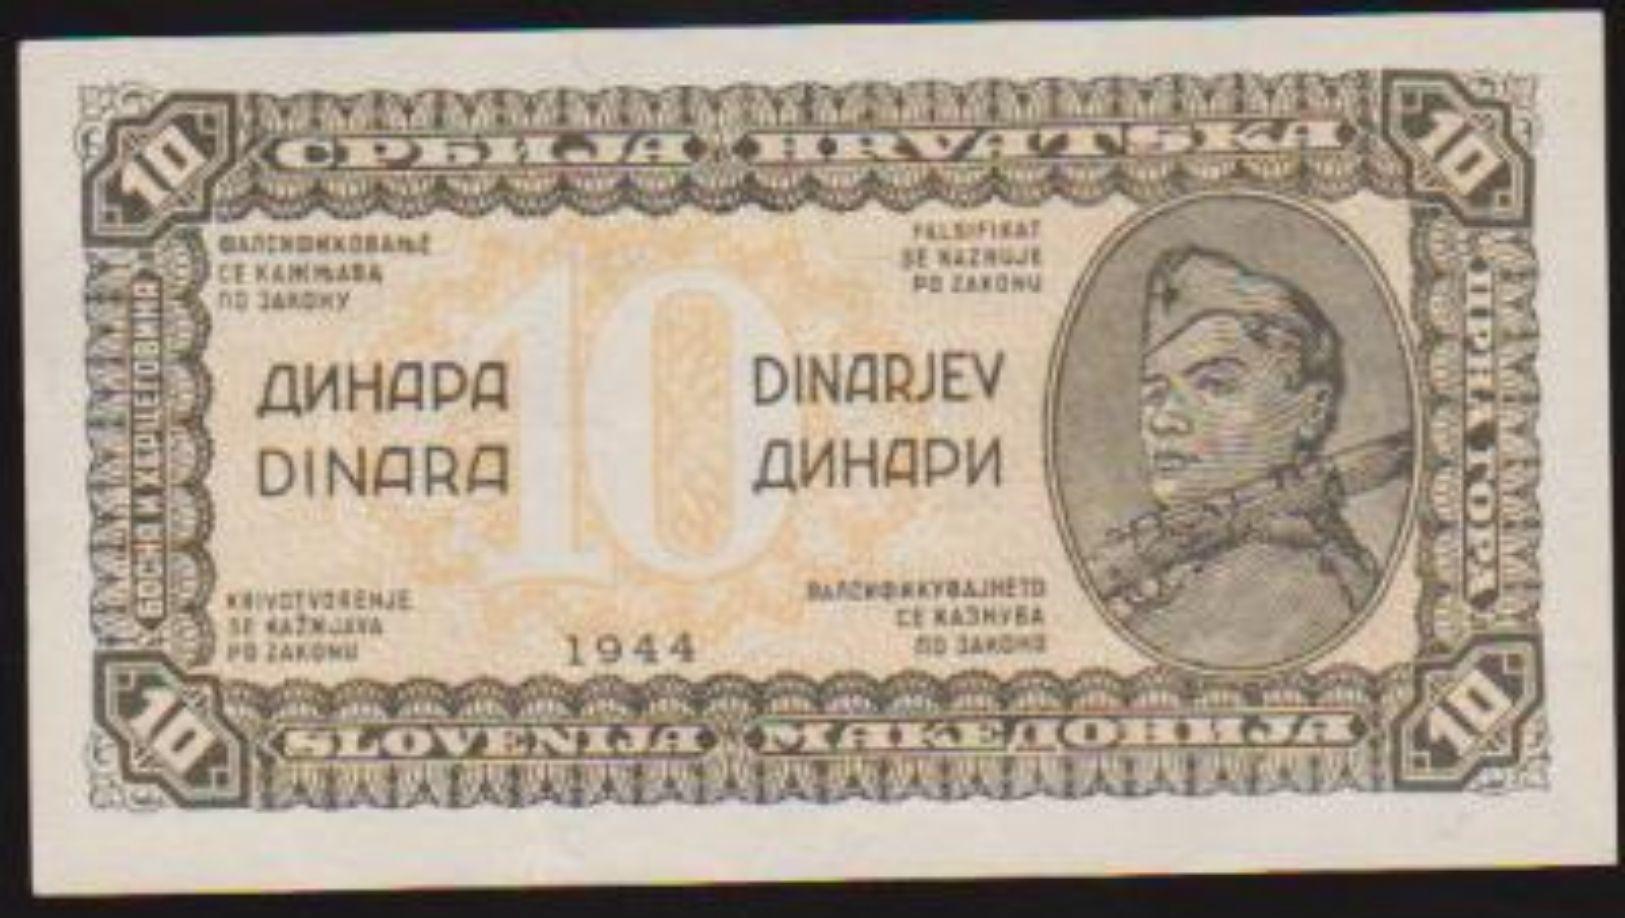 1944 JUGOSLAVIA (SLOVENIA) TEN DINARA NOTE IN A CRISP HIGH GRADE. - Jugoslavia